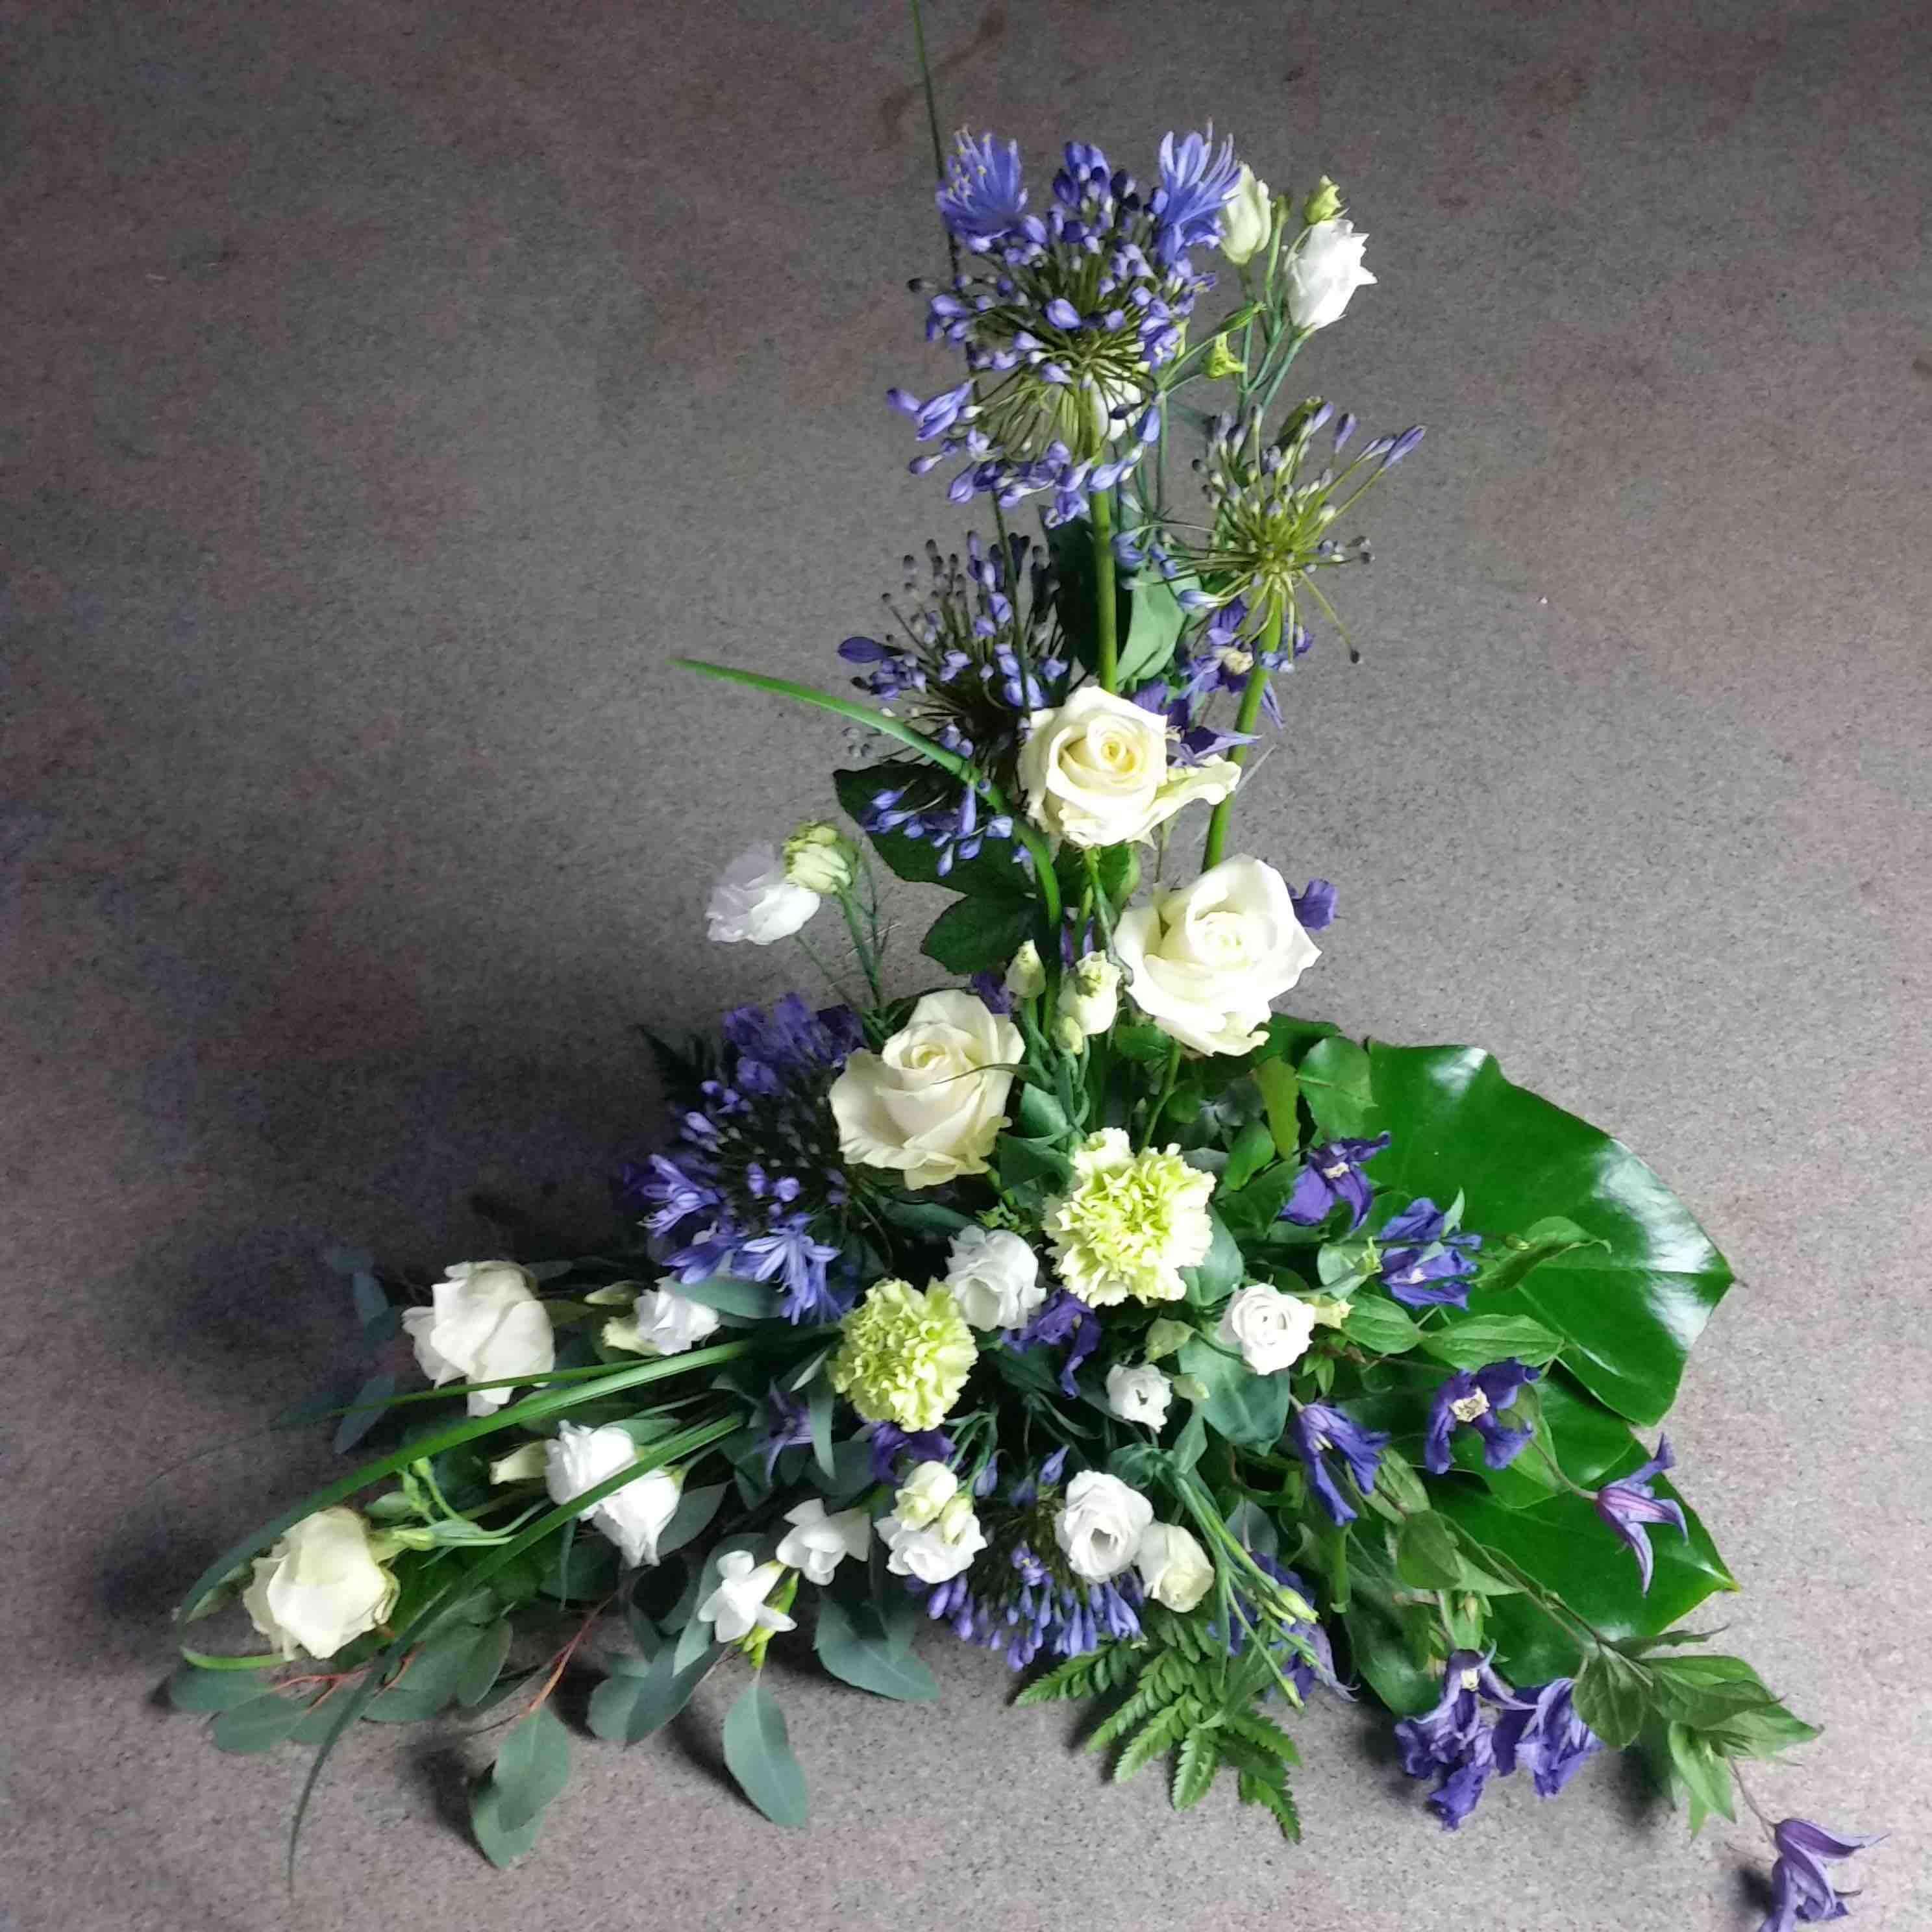 pris begravningsblommor exempel hög begravningsdekoration